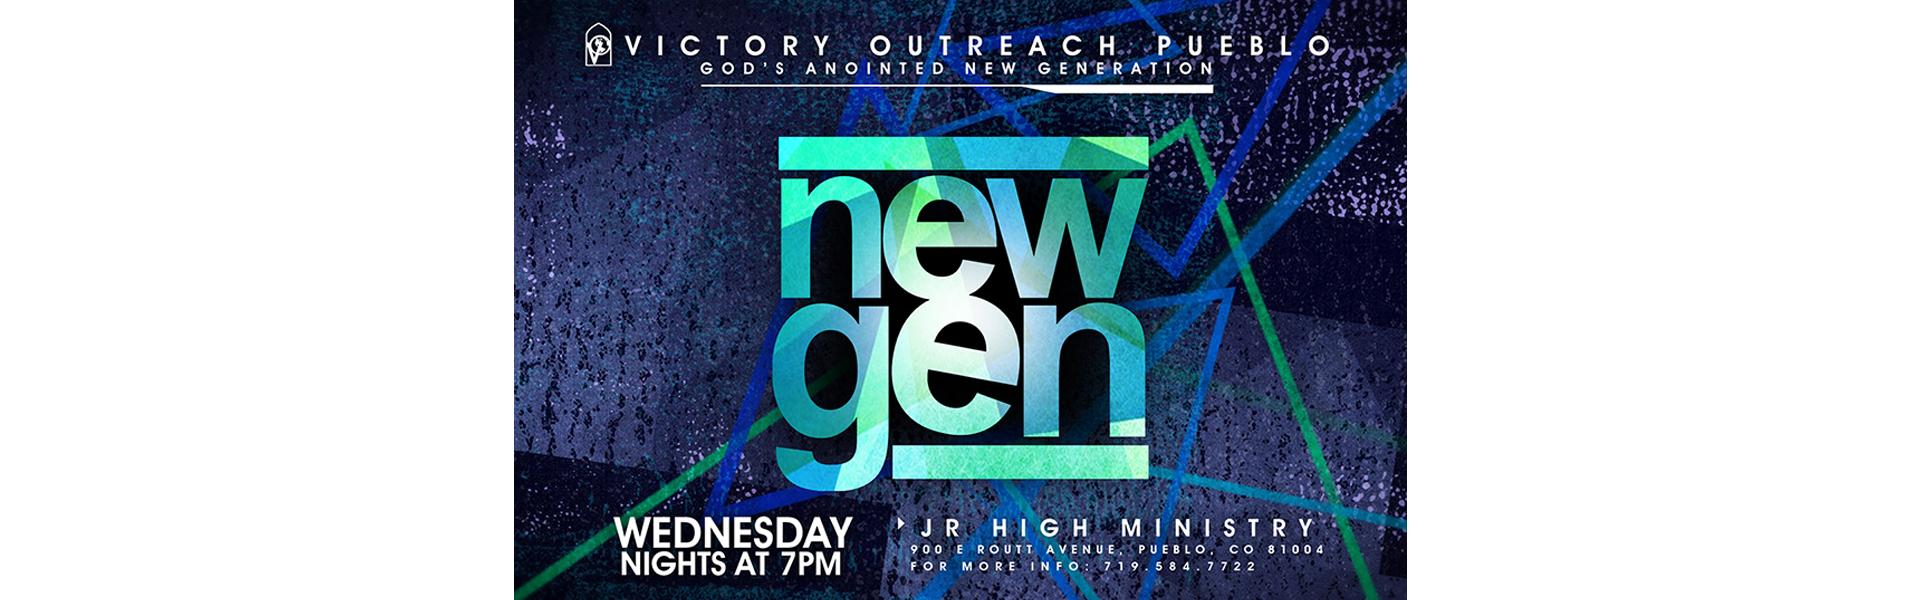 New Gen Wednesdays